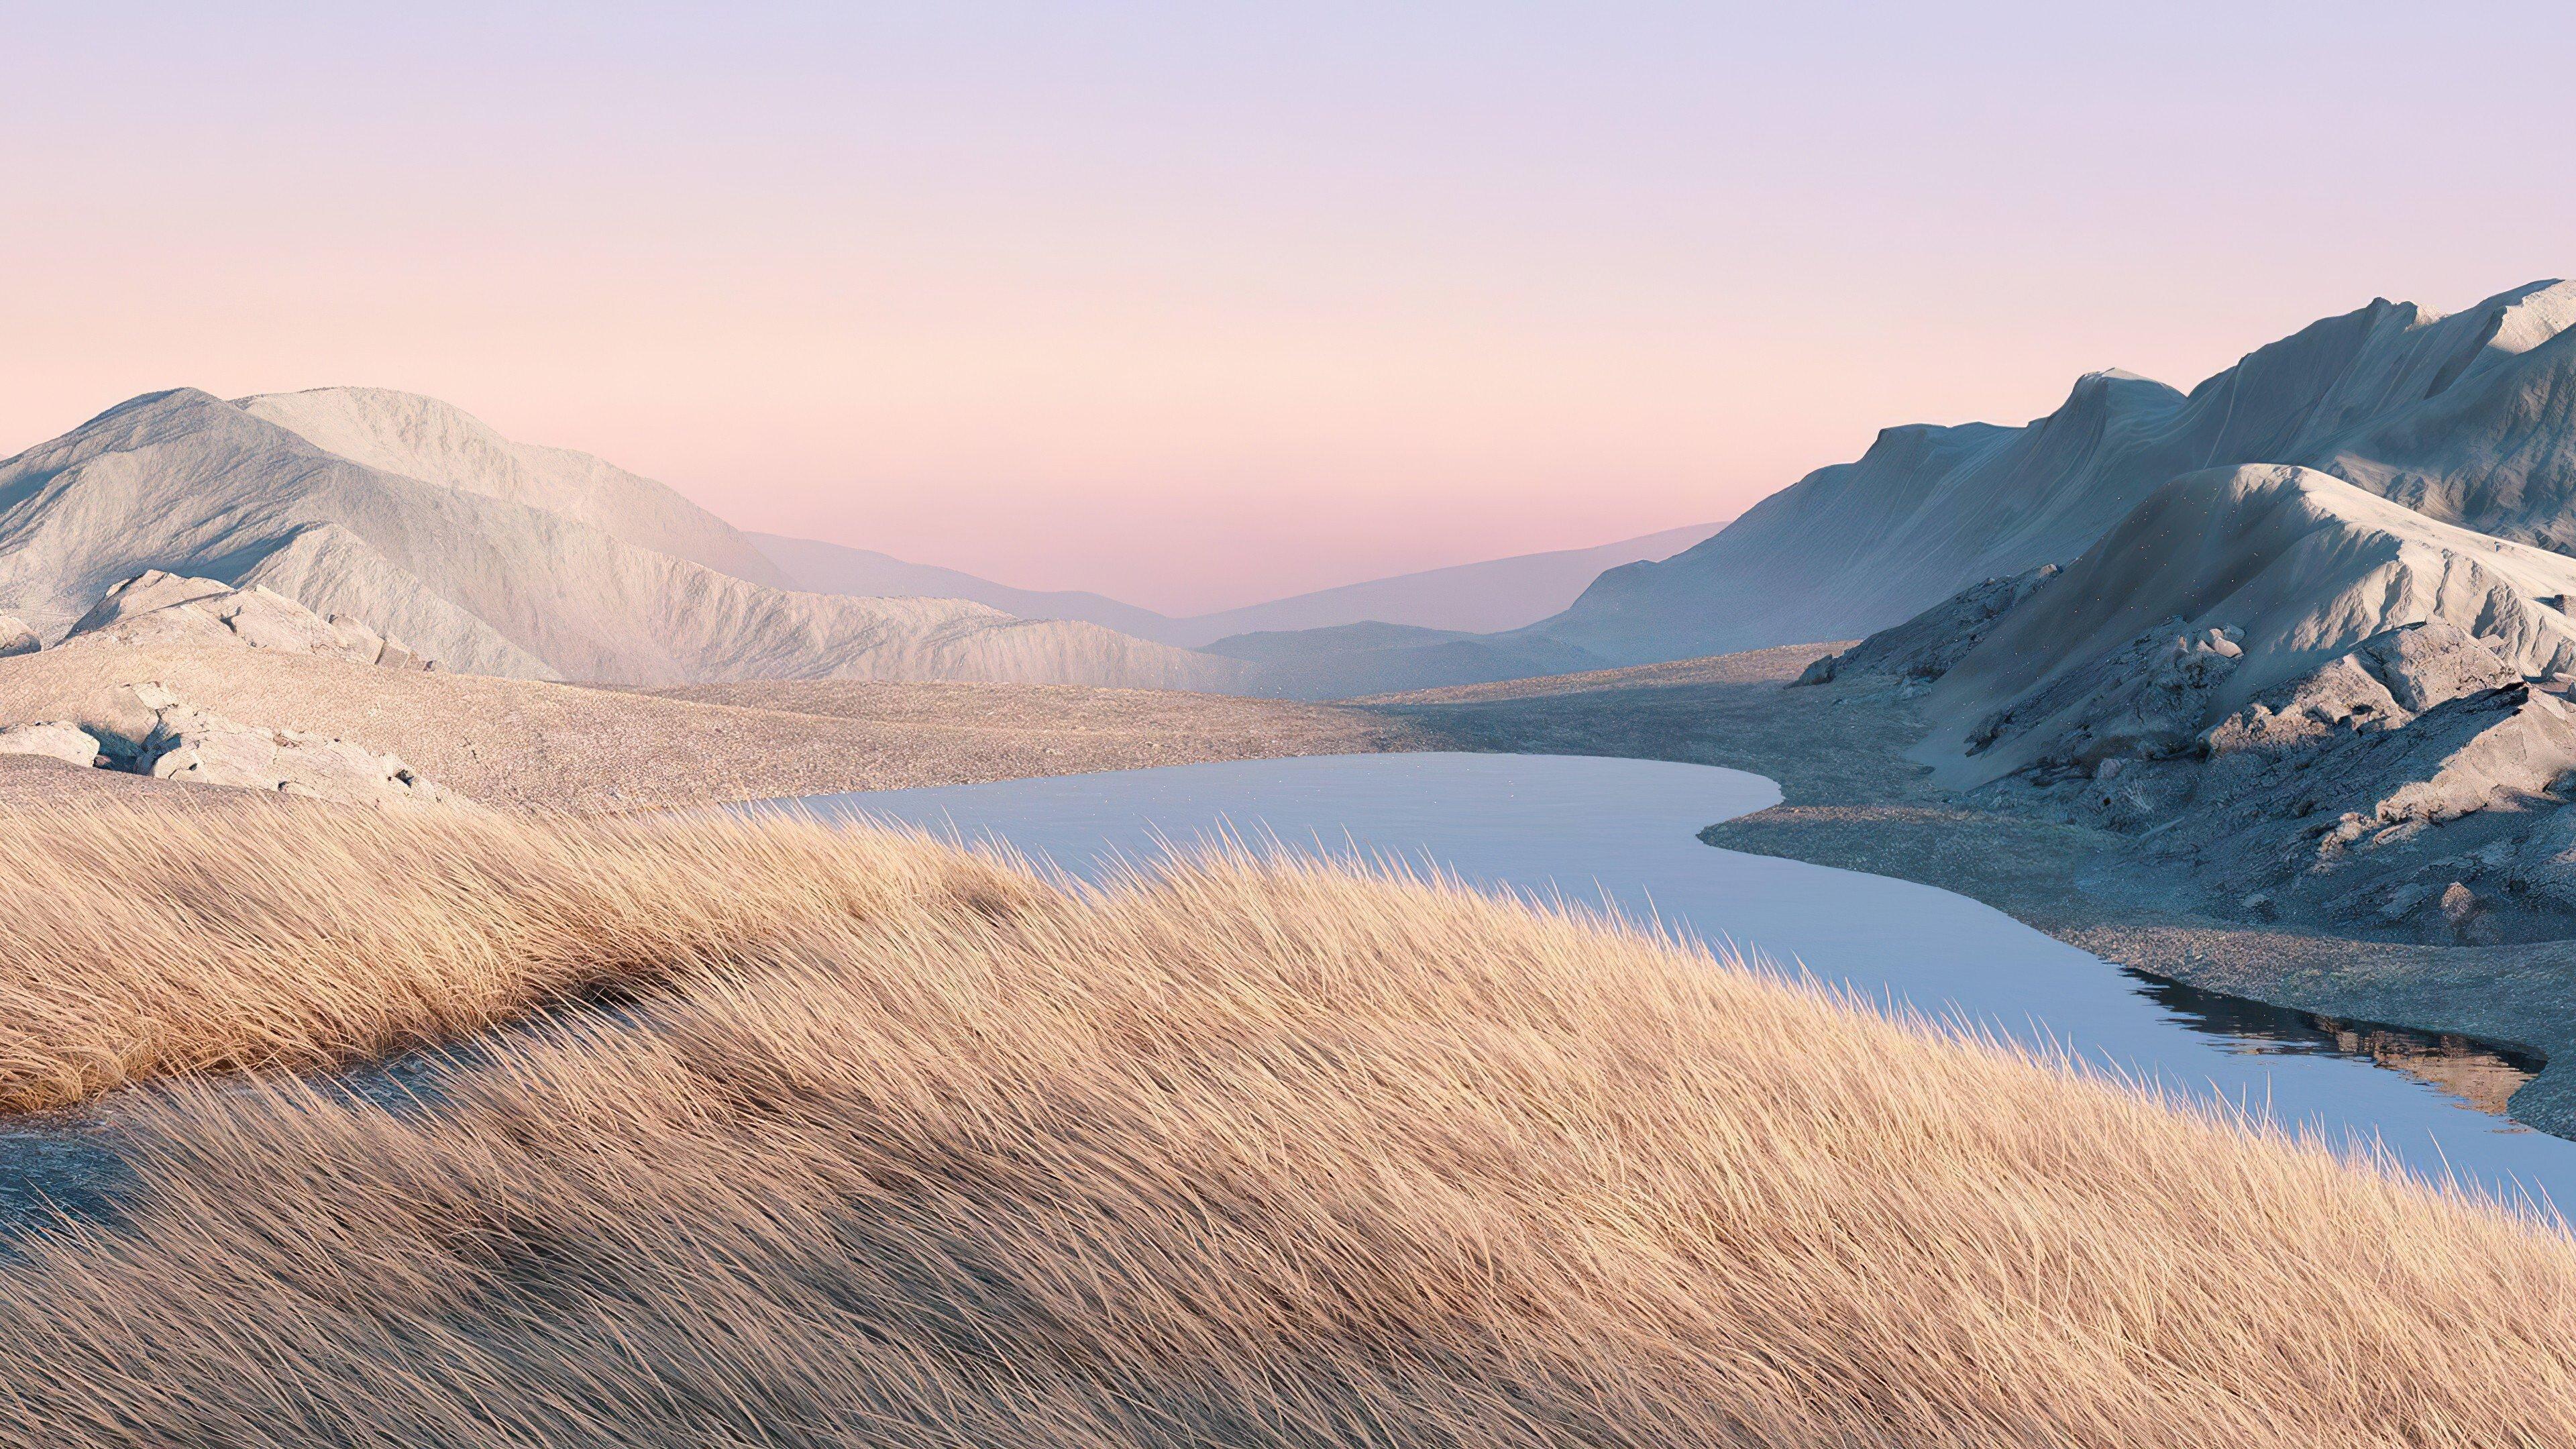 Fondos de pantalla Paisaje digital de montañas